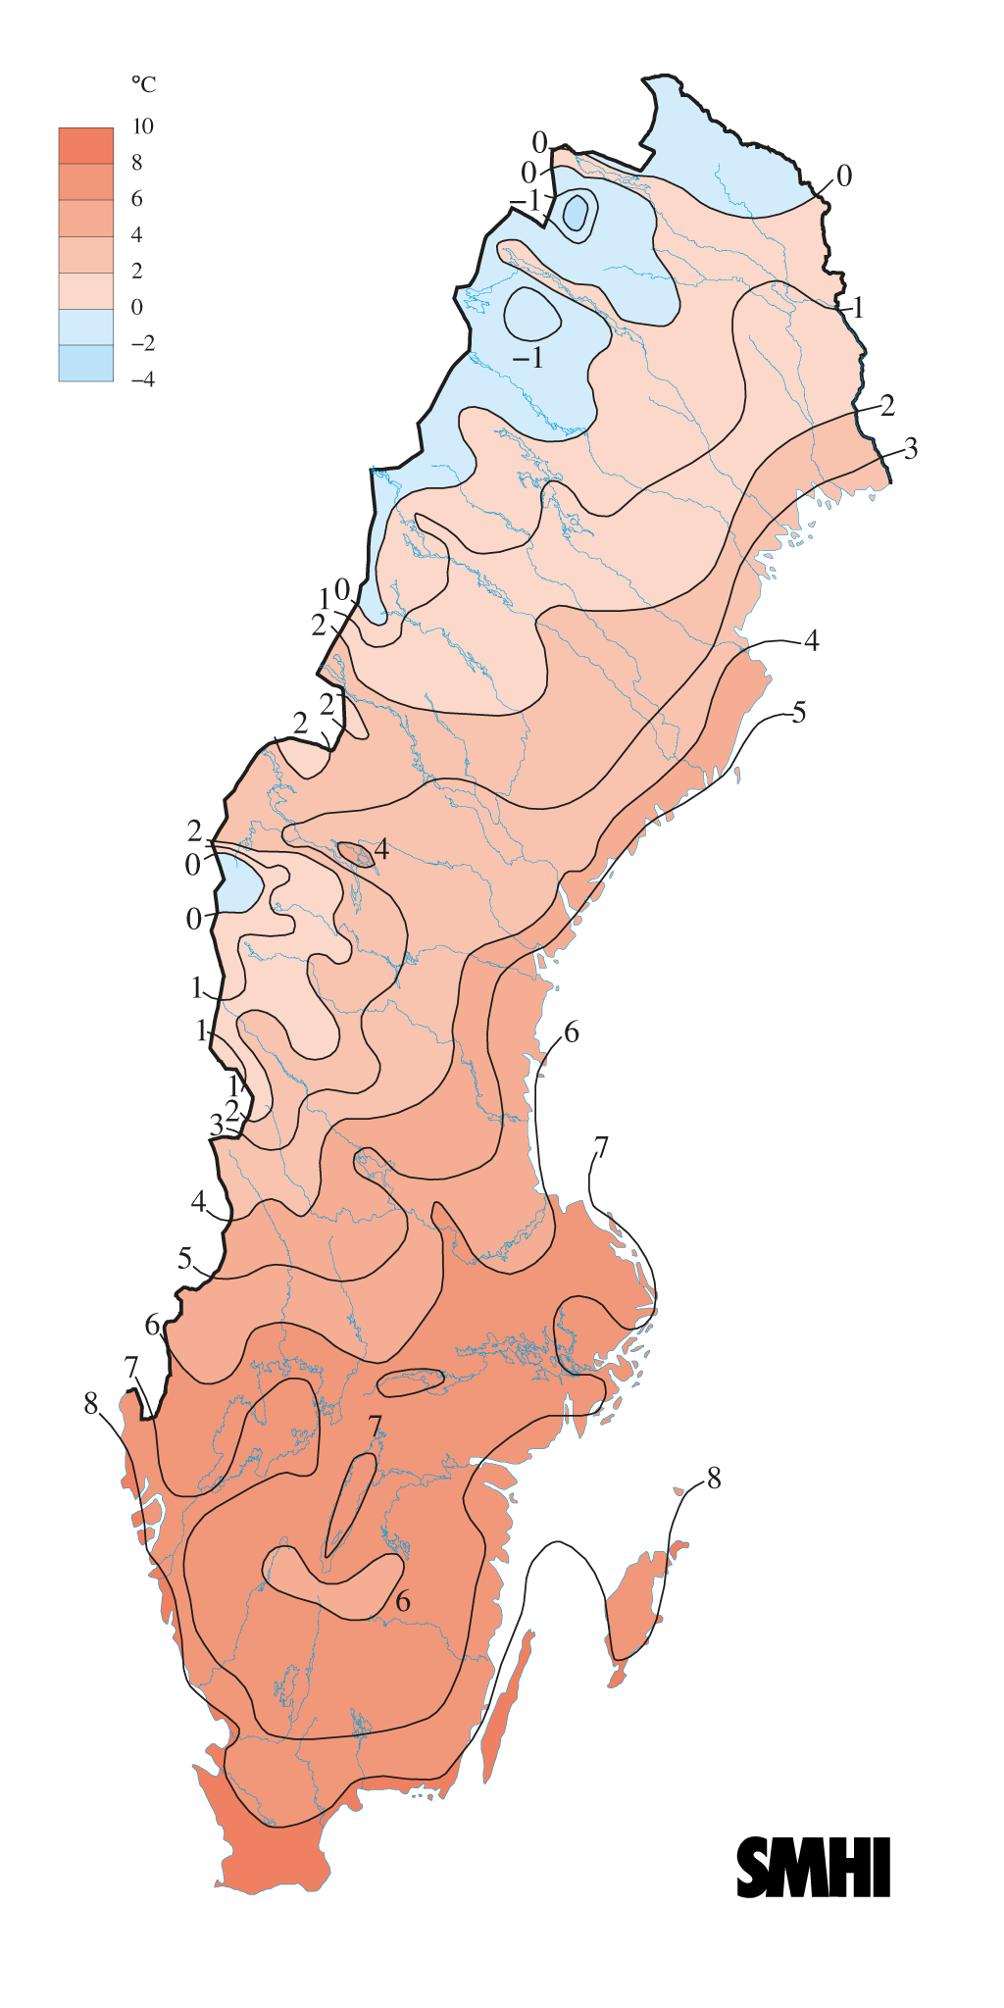 höjd över havet karta sverige SMHI   Månads , årstids  och årskartor | SMHI höjd över havet karta sverige